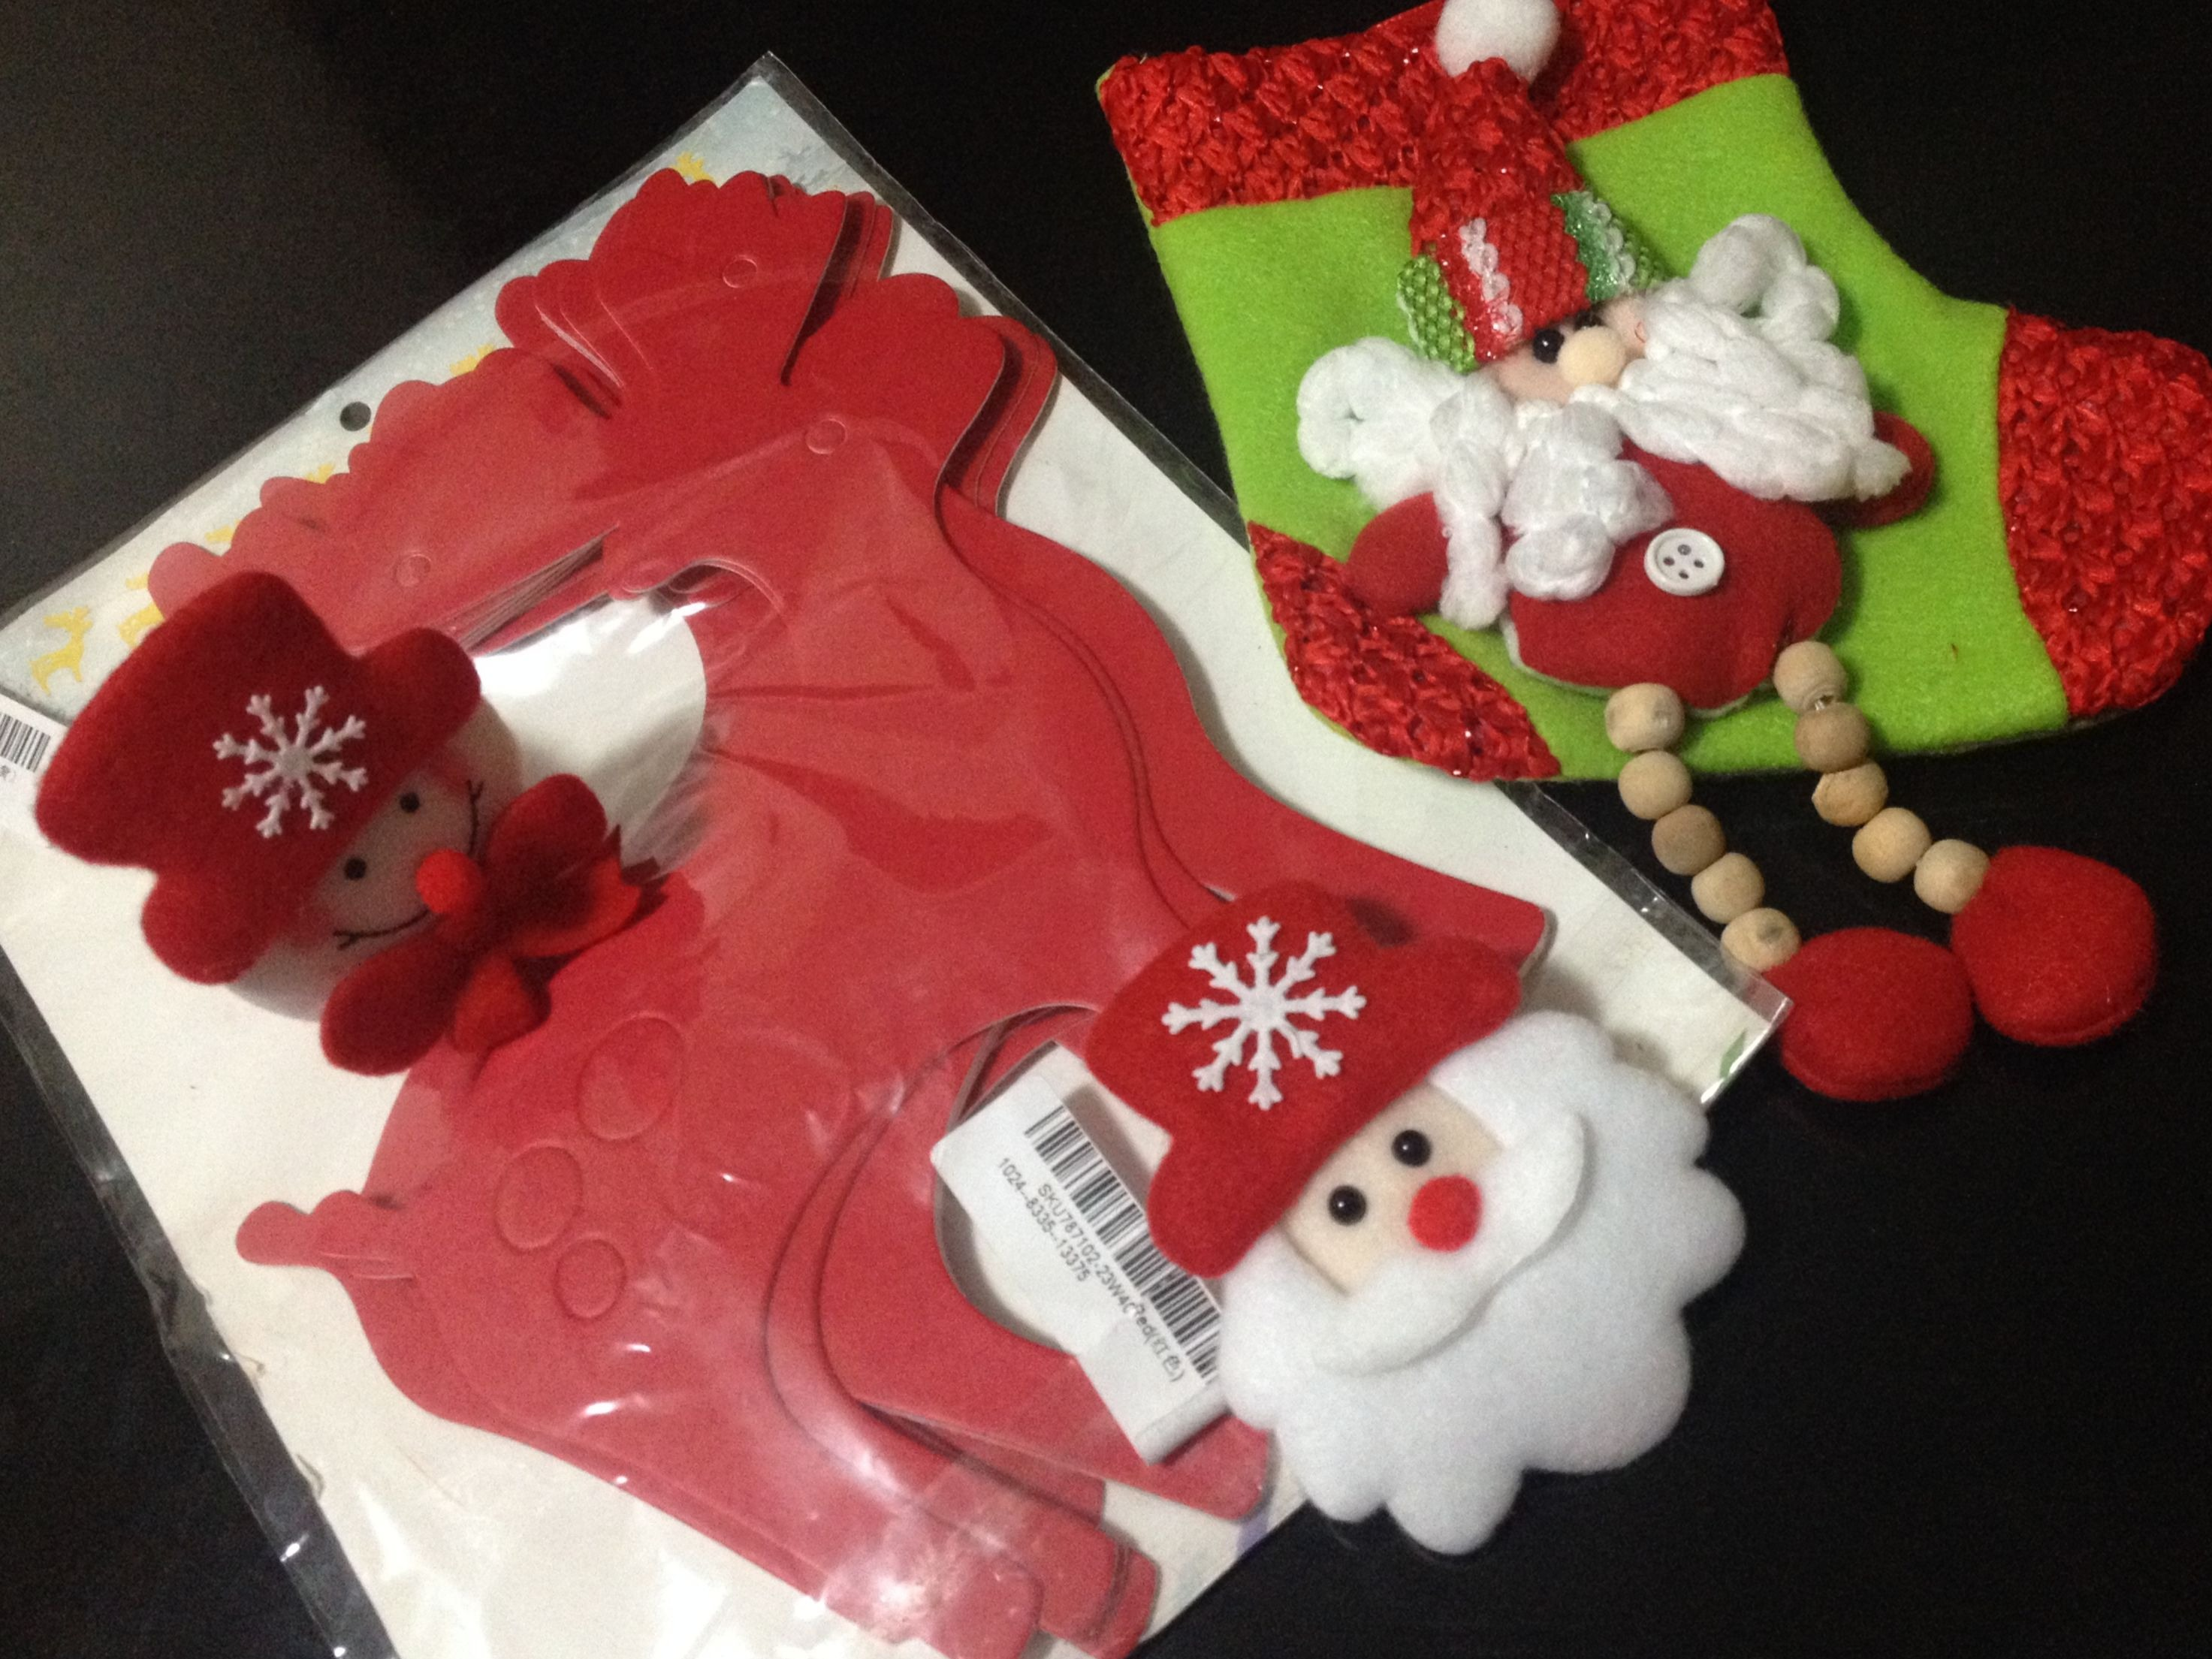 Veio da Banggood | Efeites de Natal